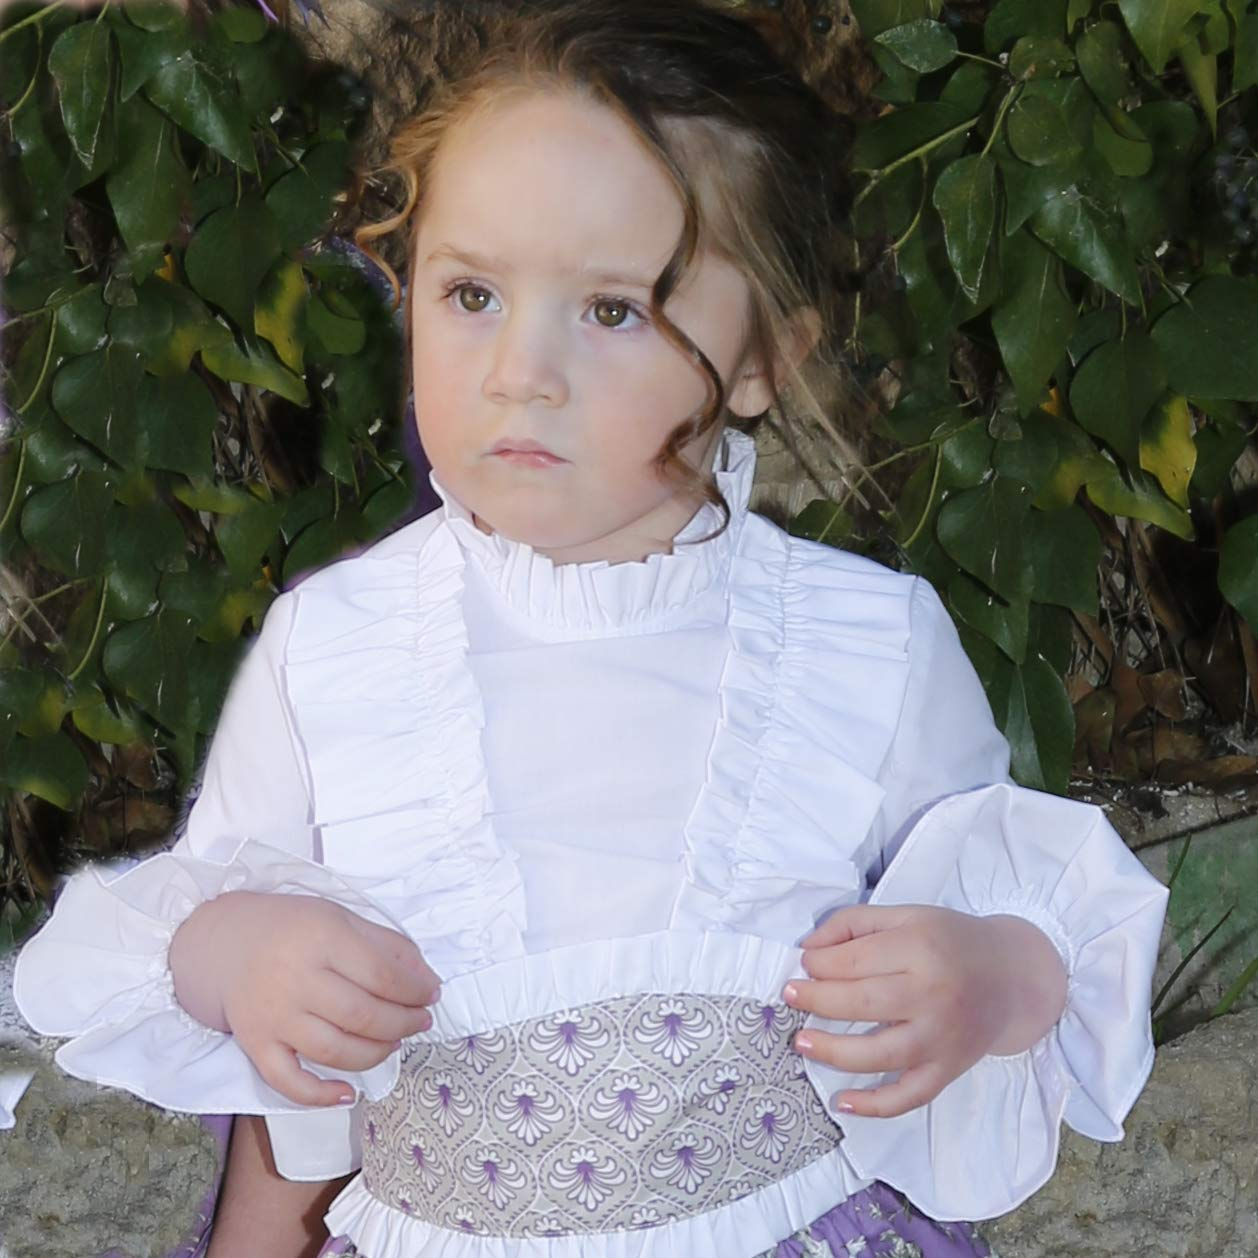 Camisa Blanca con Volantes Godettia Fabricado en Espa/ña